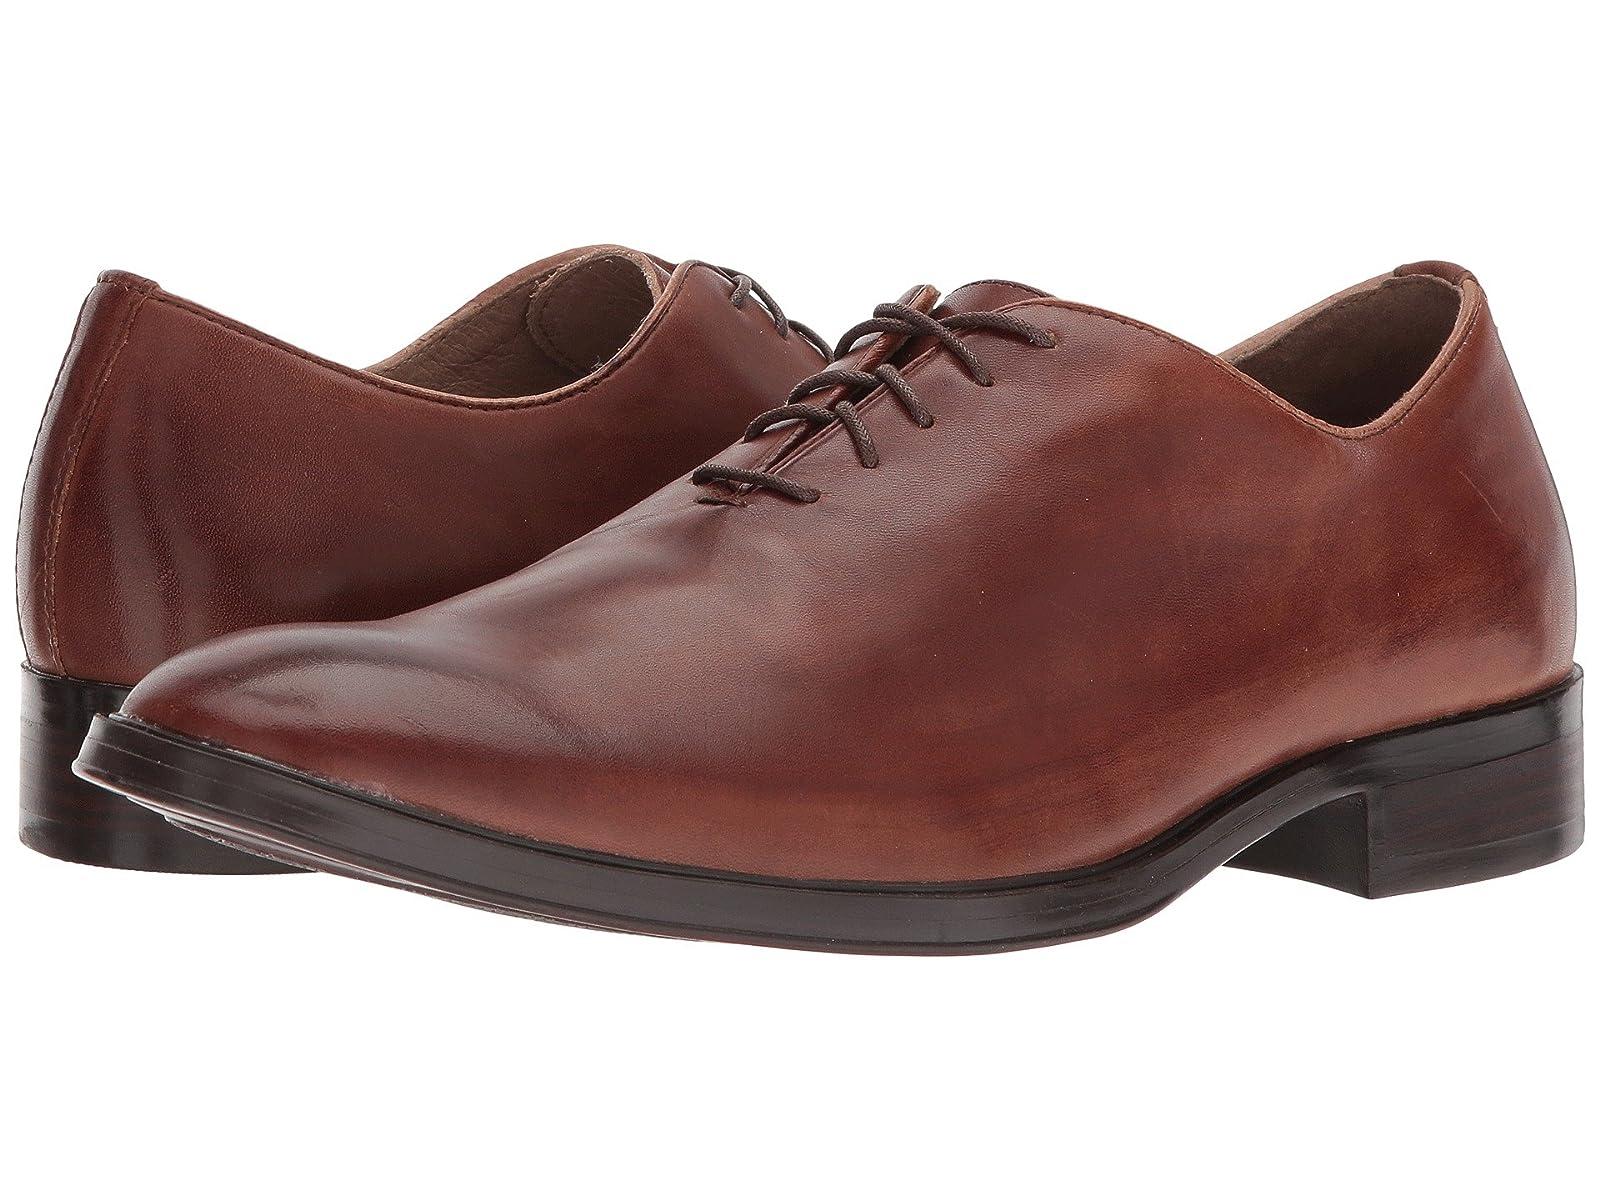 Mark Nason Traditional Dress - HopperAtmospheric grades have affordable shoes